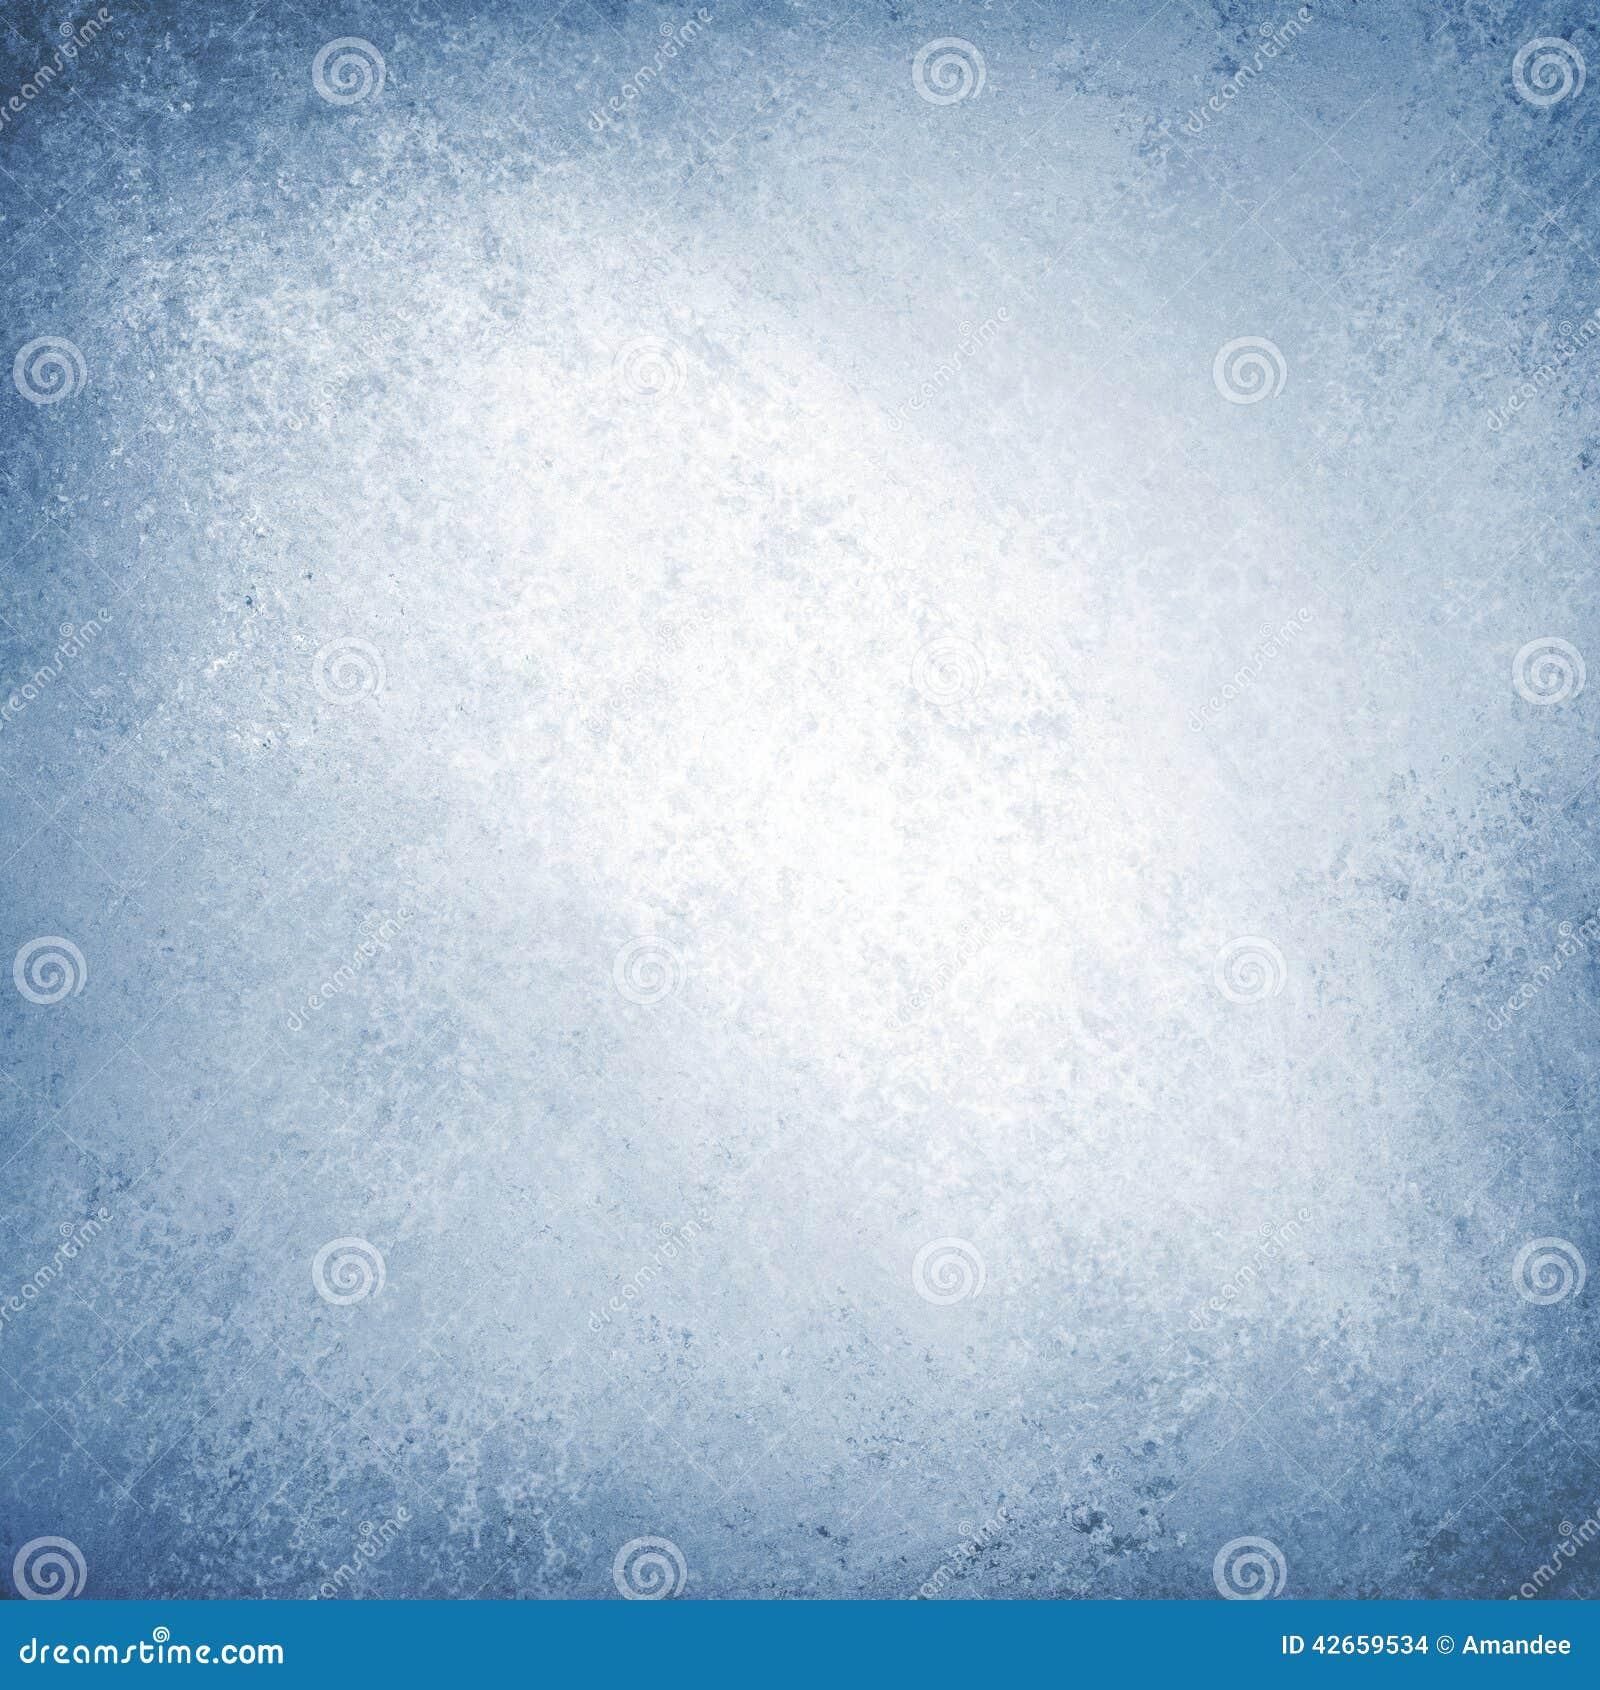 White Background Blue Border Vintage Texture